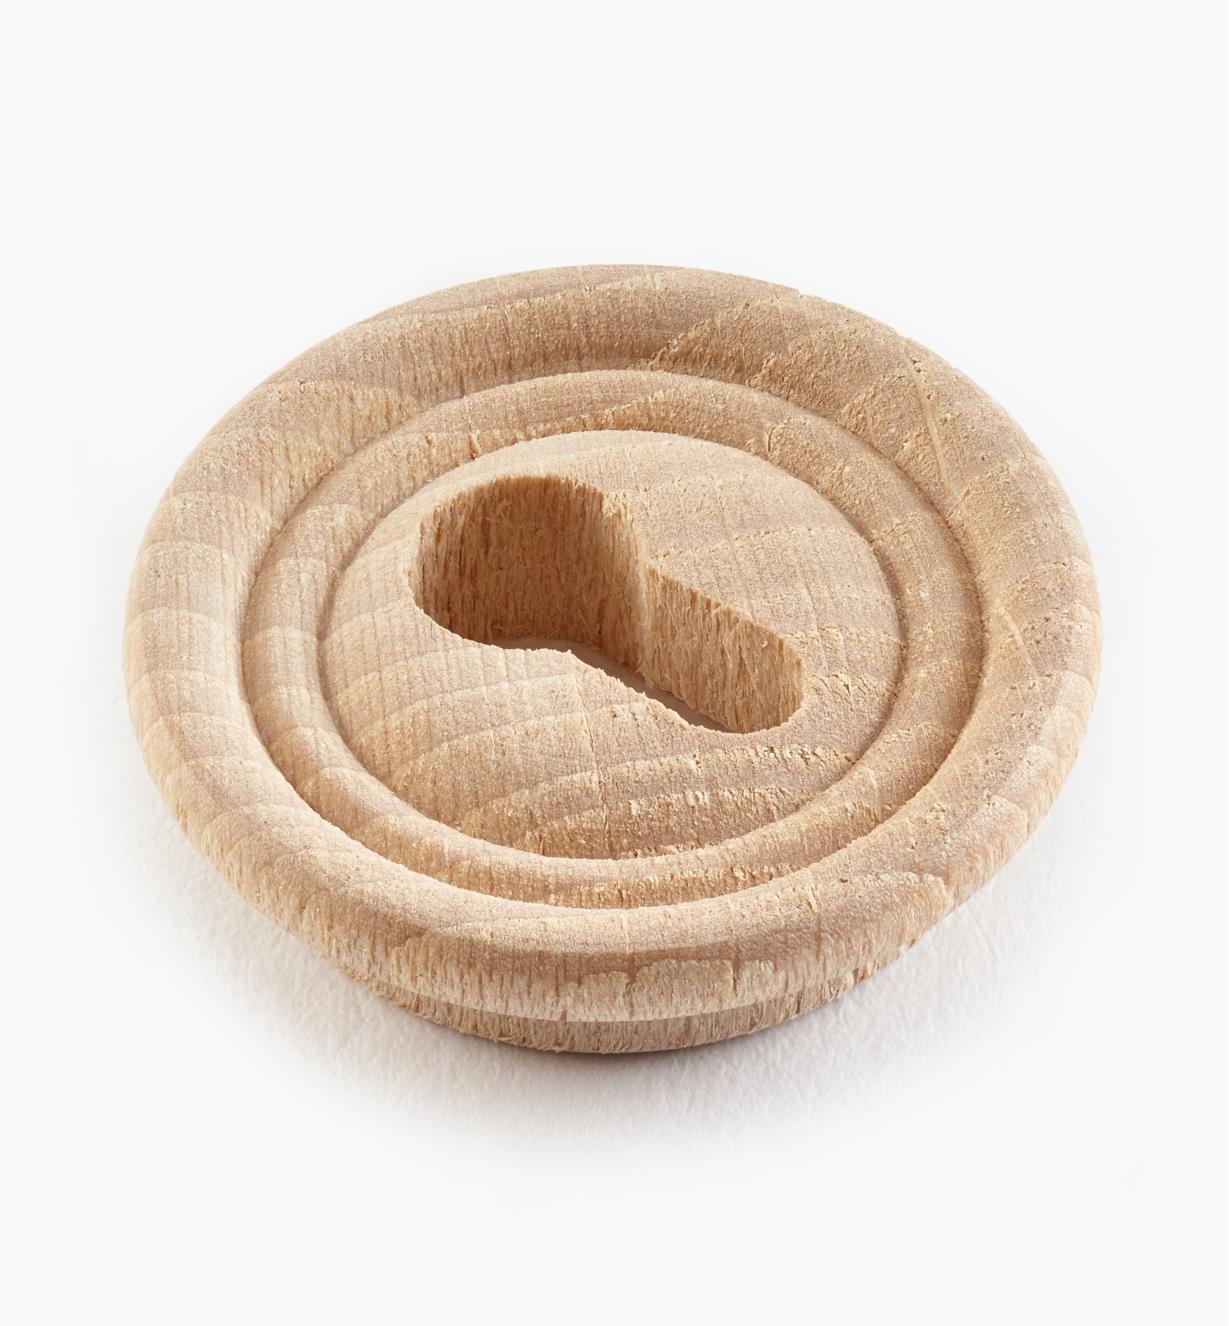 00A1120 - Insert Wood Escutcheon